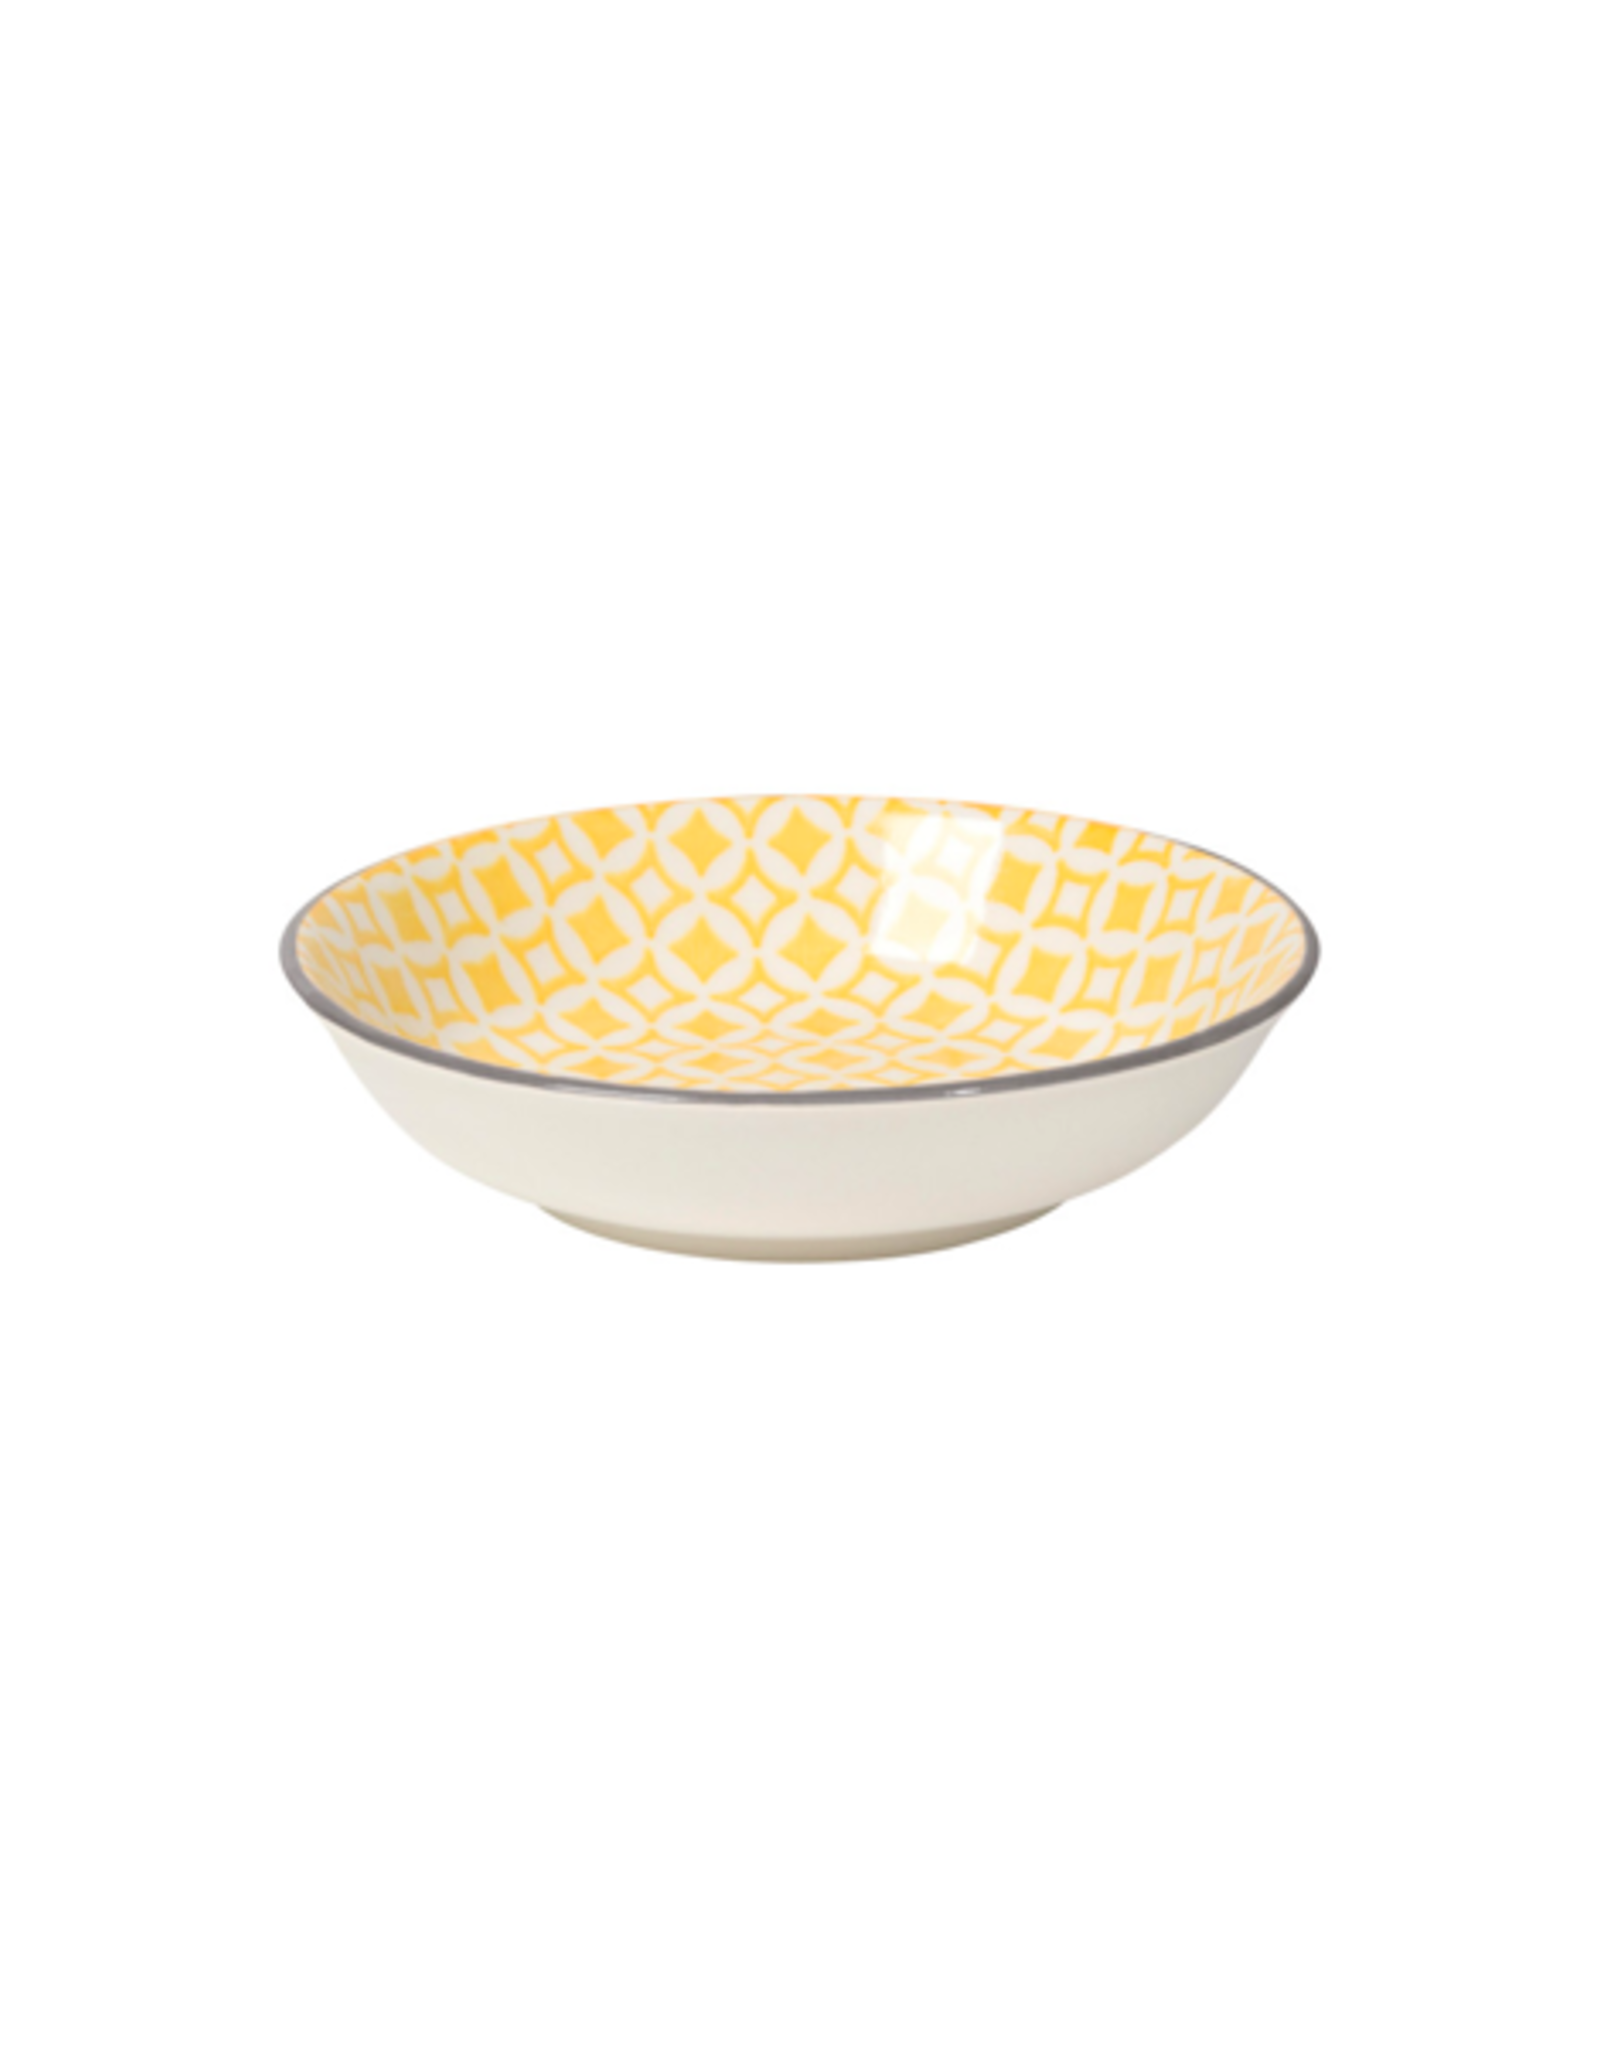 "DCA - Dip Bowl/Grey & Yellow, 3.75"""